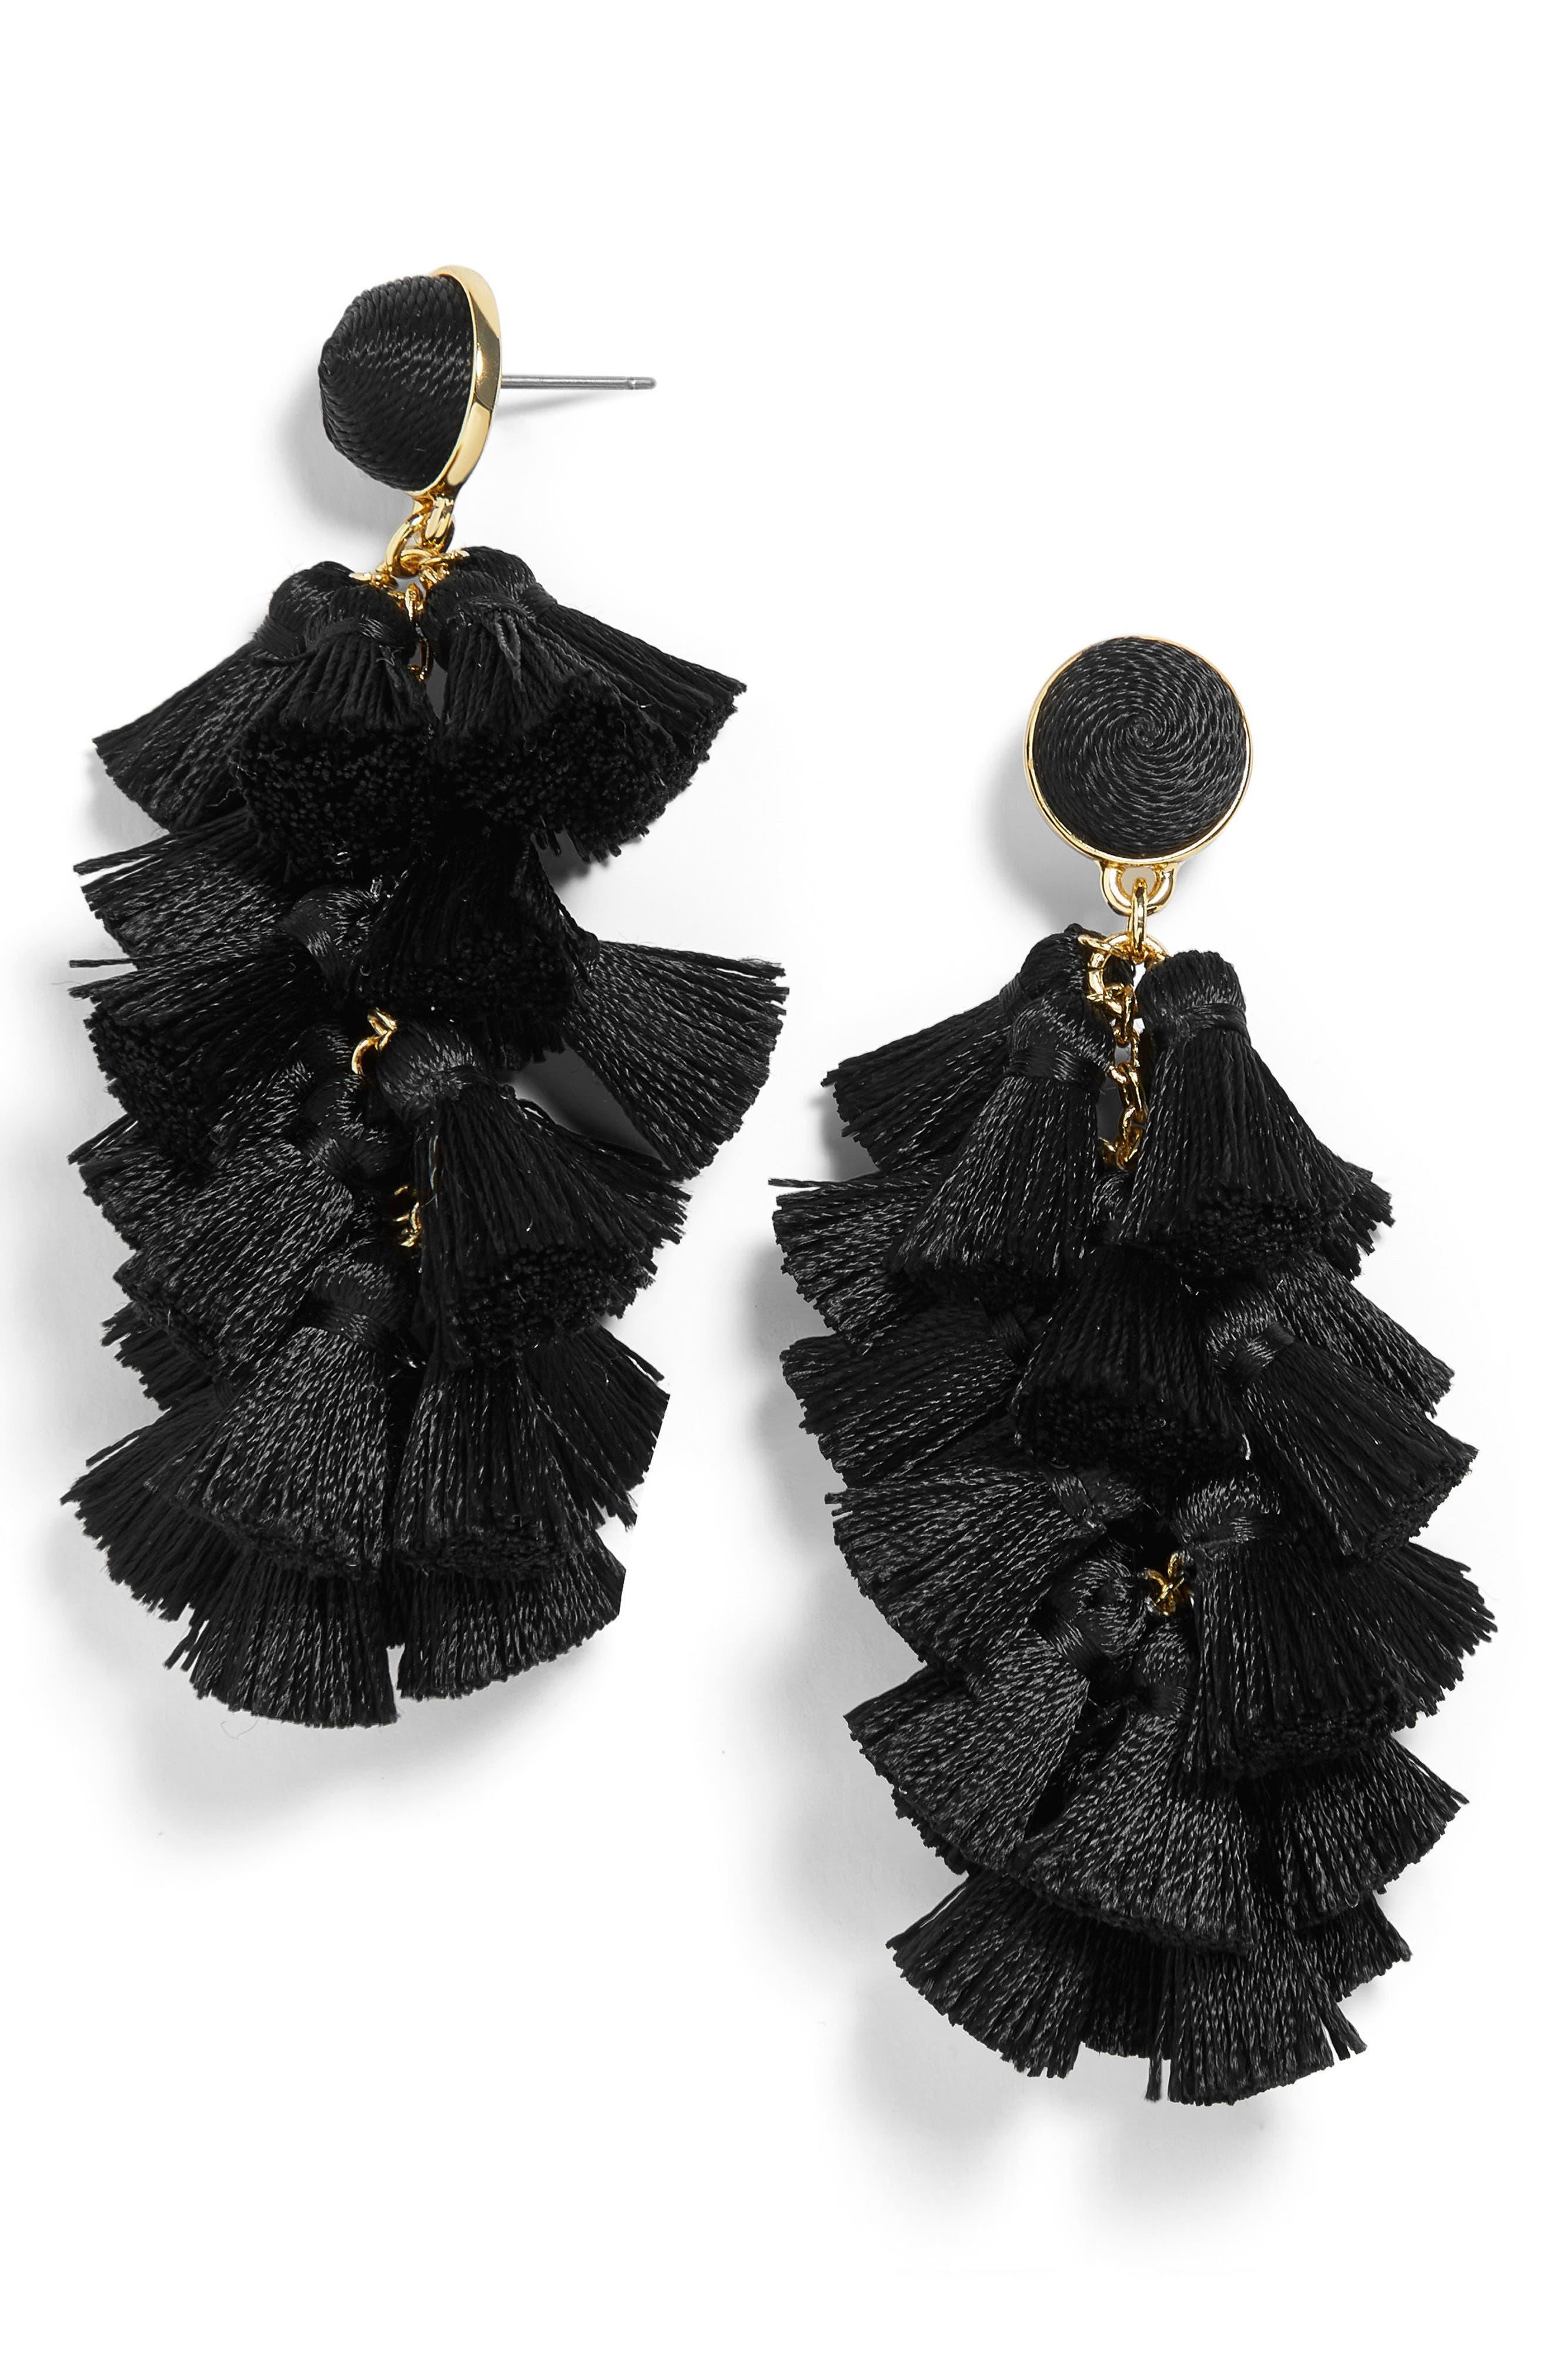 Contessa Tassel Earrings,                             Main thumbnail 1, color,                             BLACK